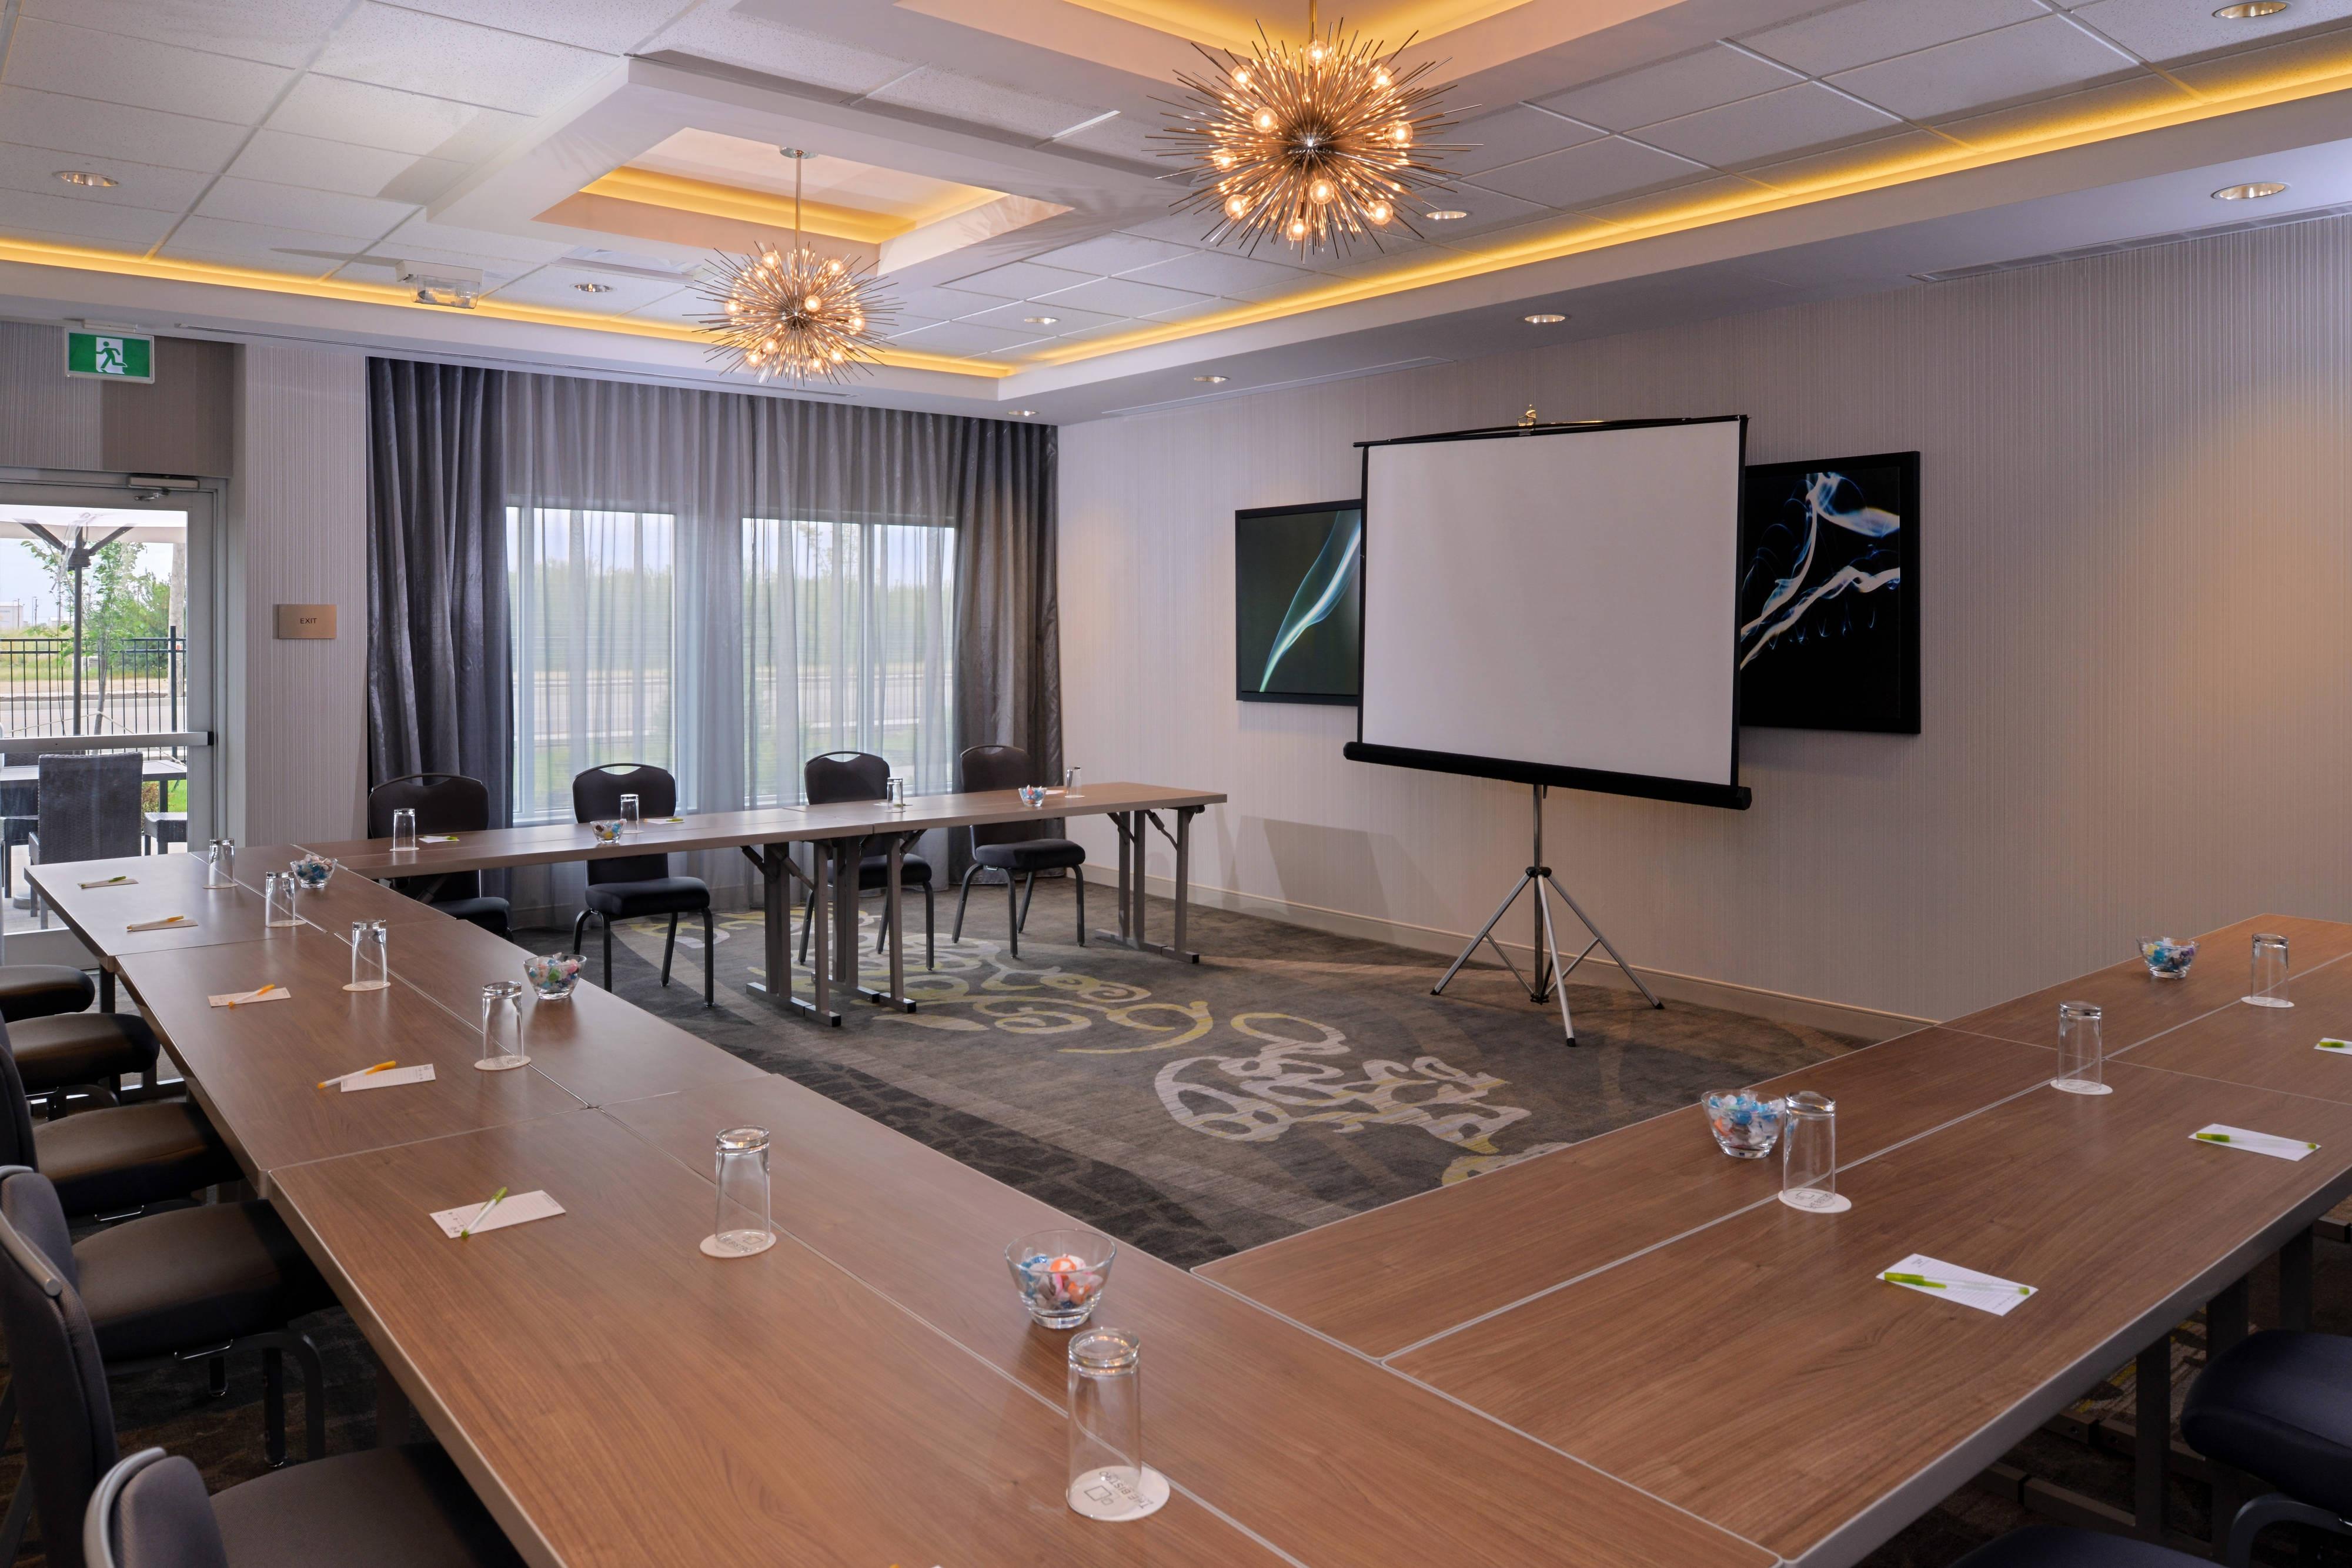 Meeting Room - U-Shape Seating